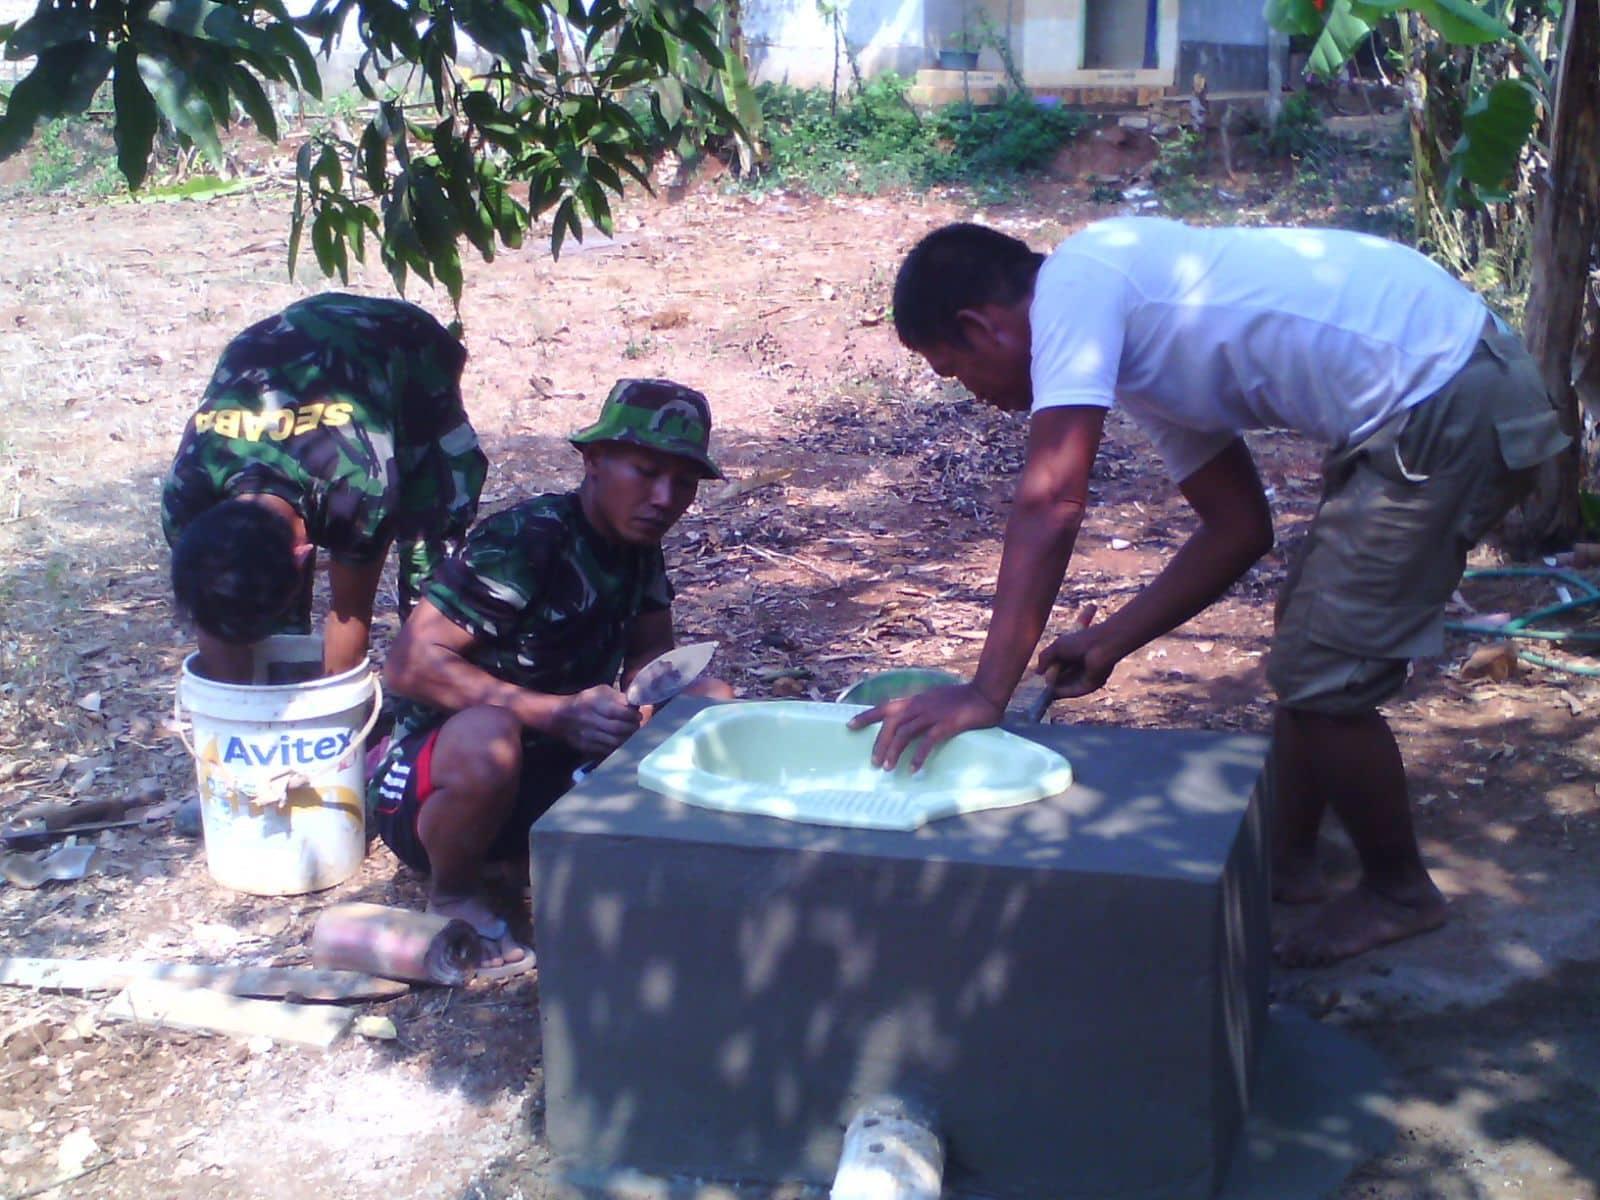 Wujudkan Dambaan Masyarakat, Koramil Arosbaya Bangun Jamban